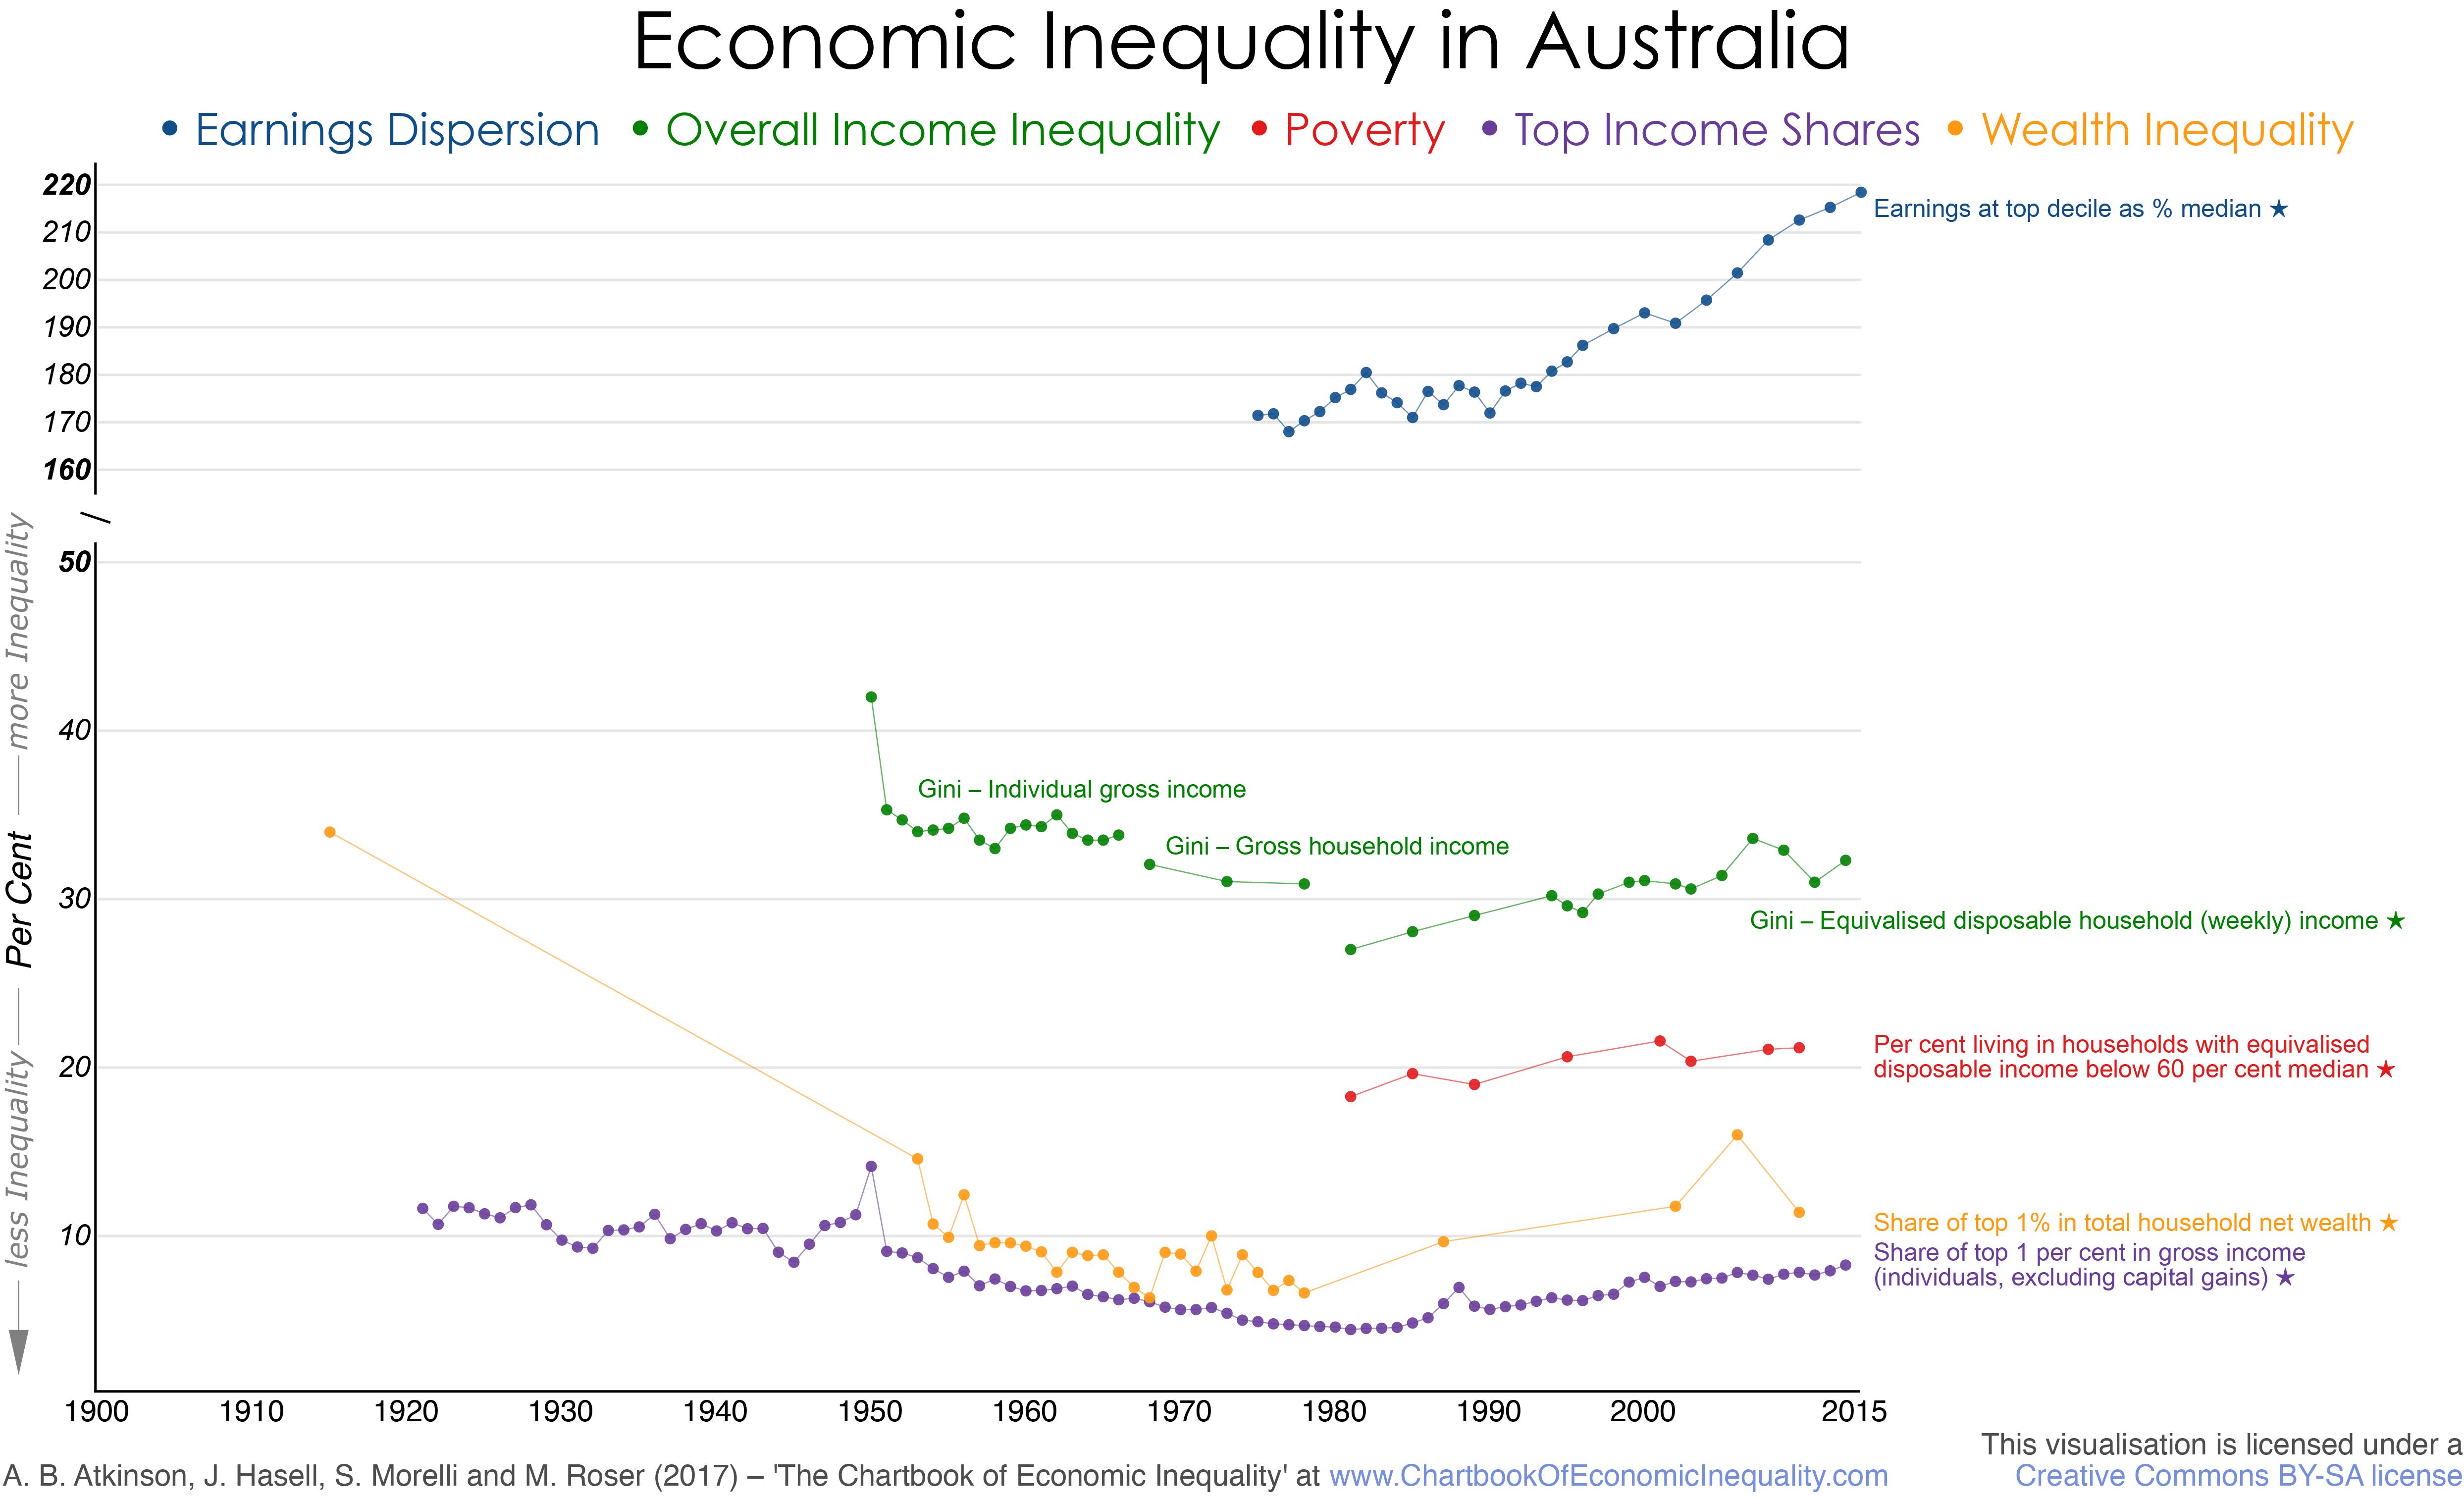 chartbookofeconomicinequality.com - Australia